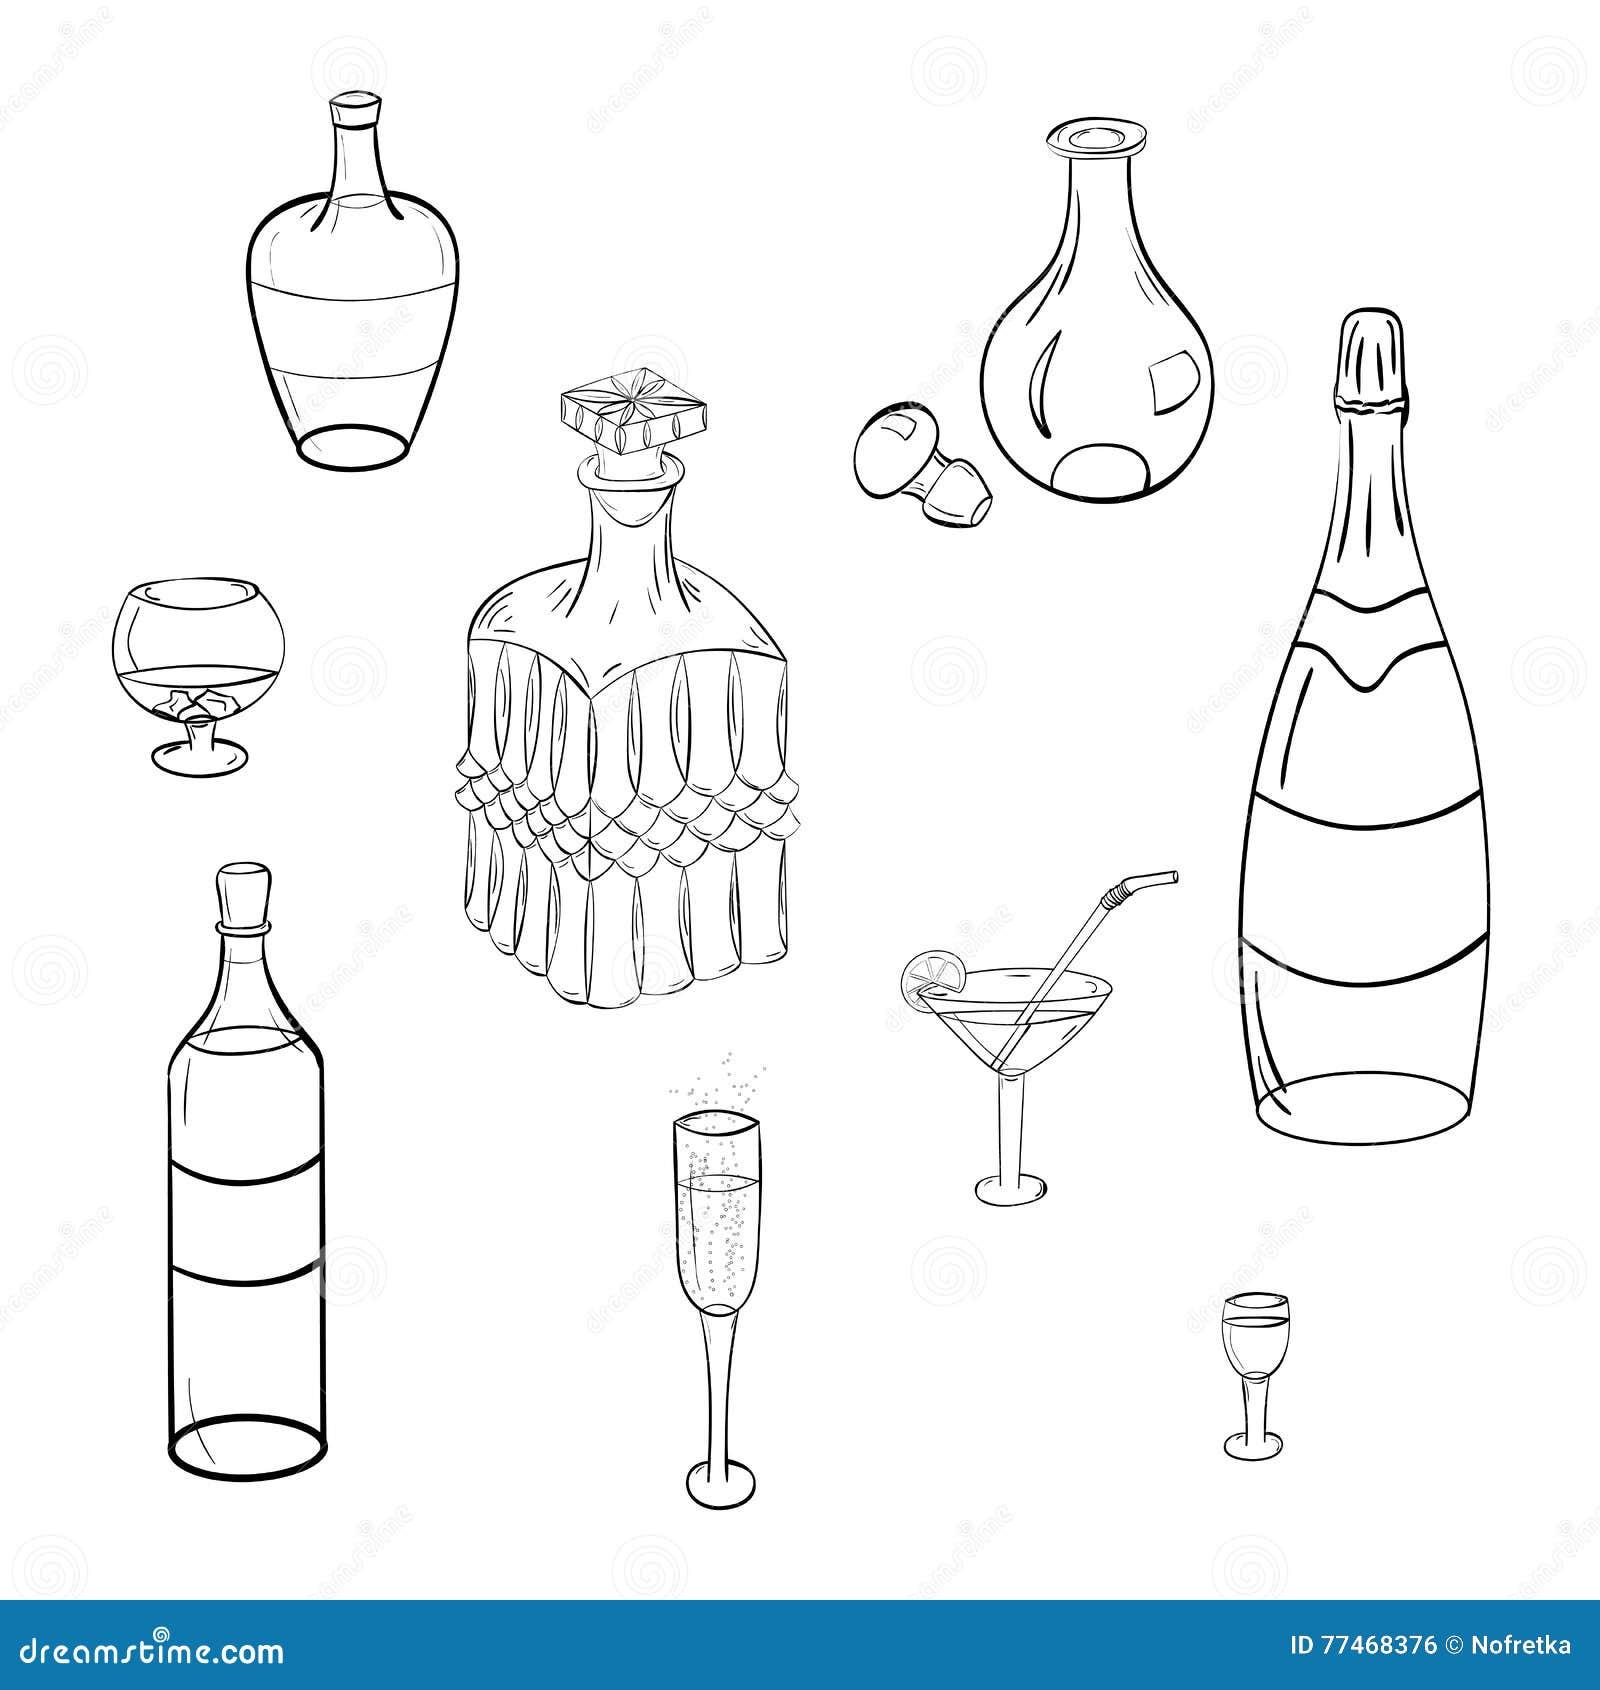 alabaster jar coloring pages - photo#13